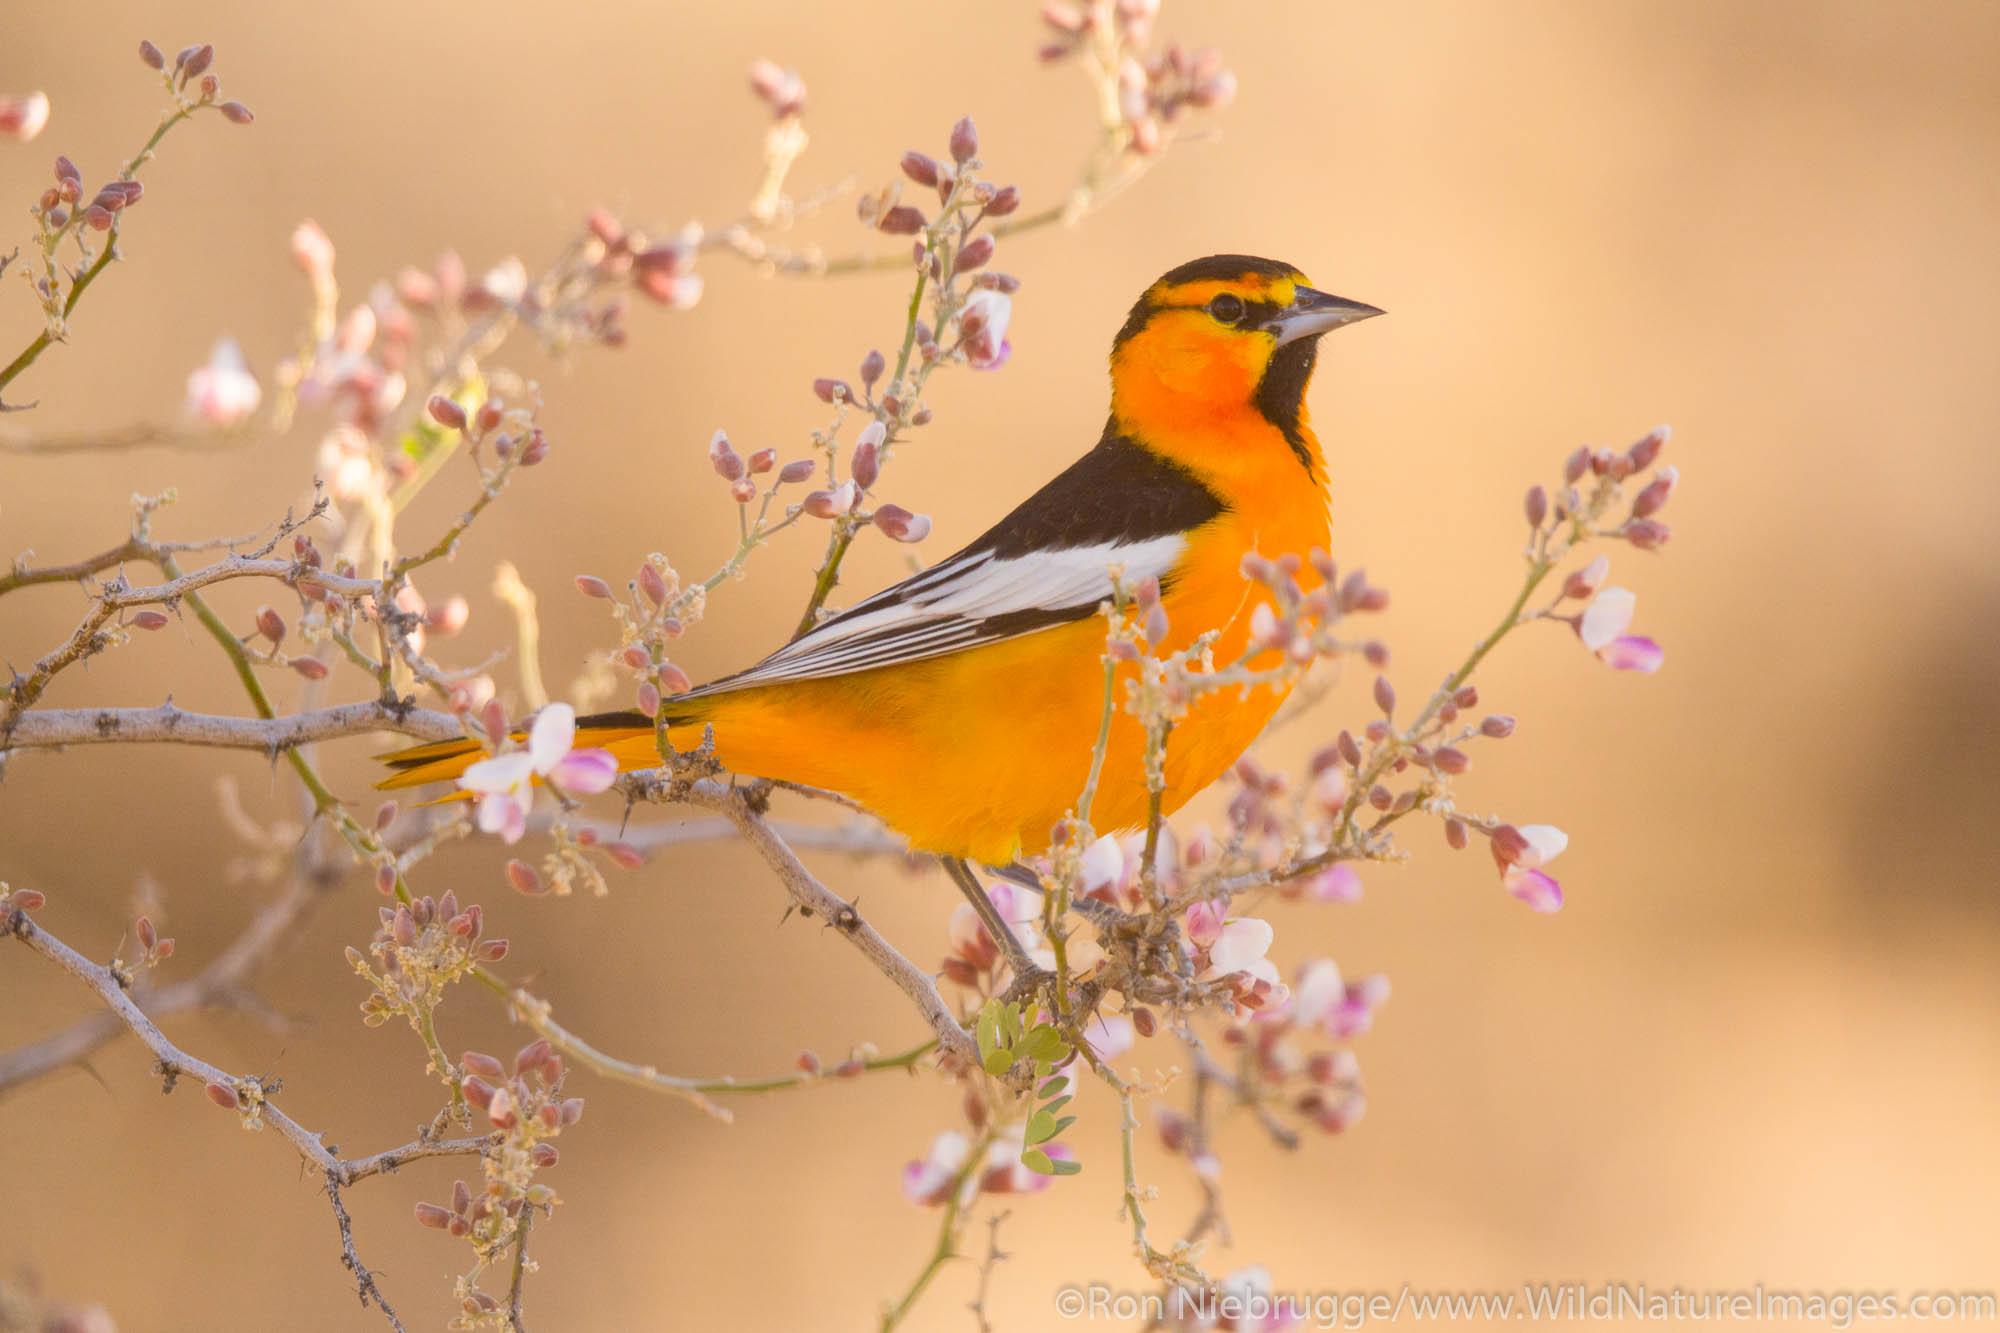 Tucson, Arizona, Bullock's oriole, bird, photos, photo